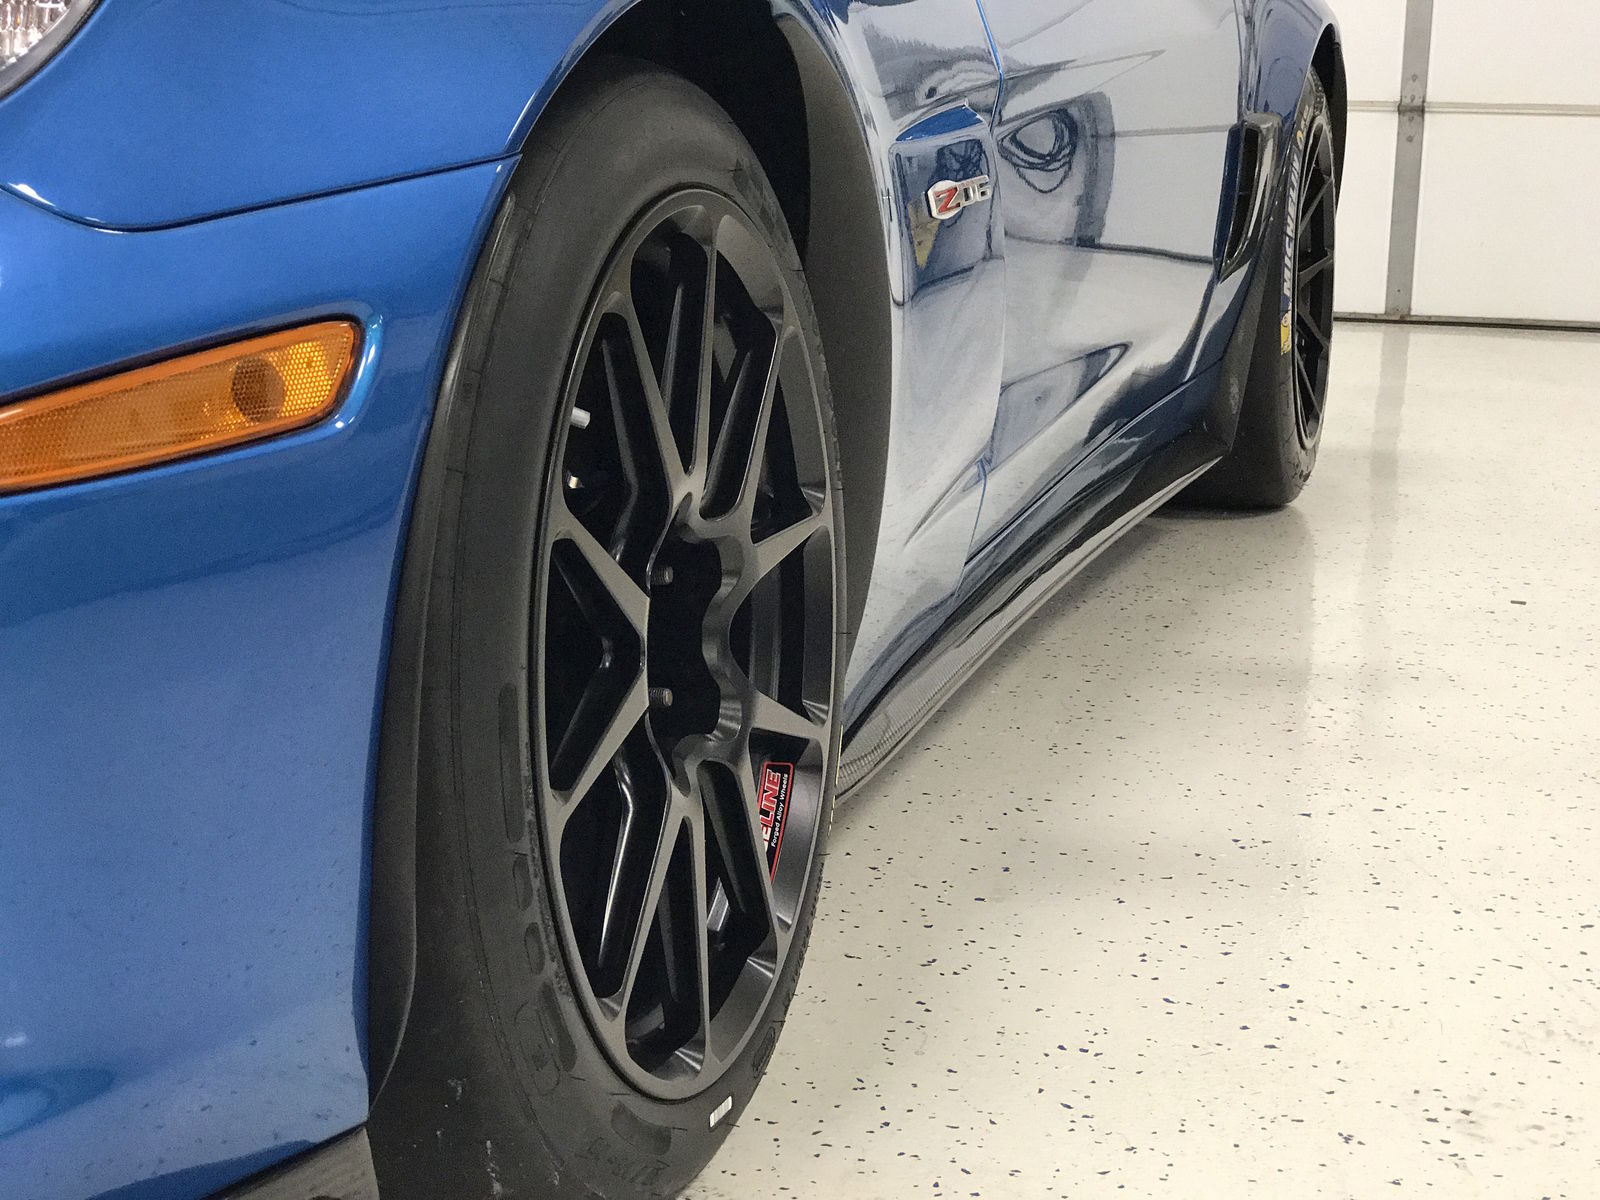 2013 Chevrolet Corvette Z06 | Track-Ready Katech 700HP C6 Corvette Z06 on Forgeline One Piece Forged Monoblock GS1R Wheels